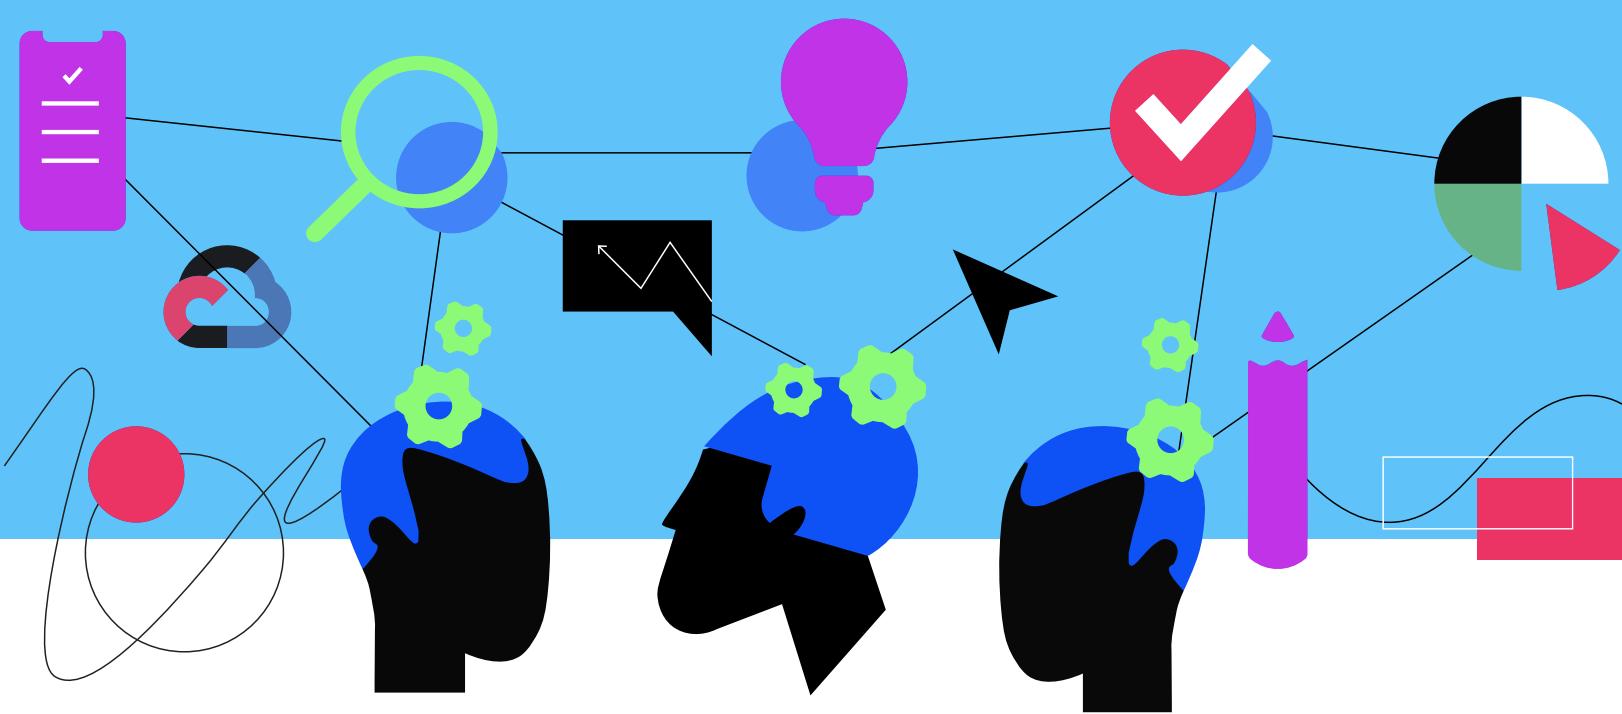 crowdsourcing-talent-illustration